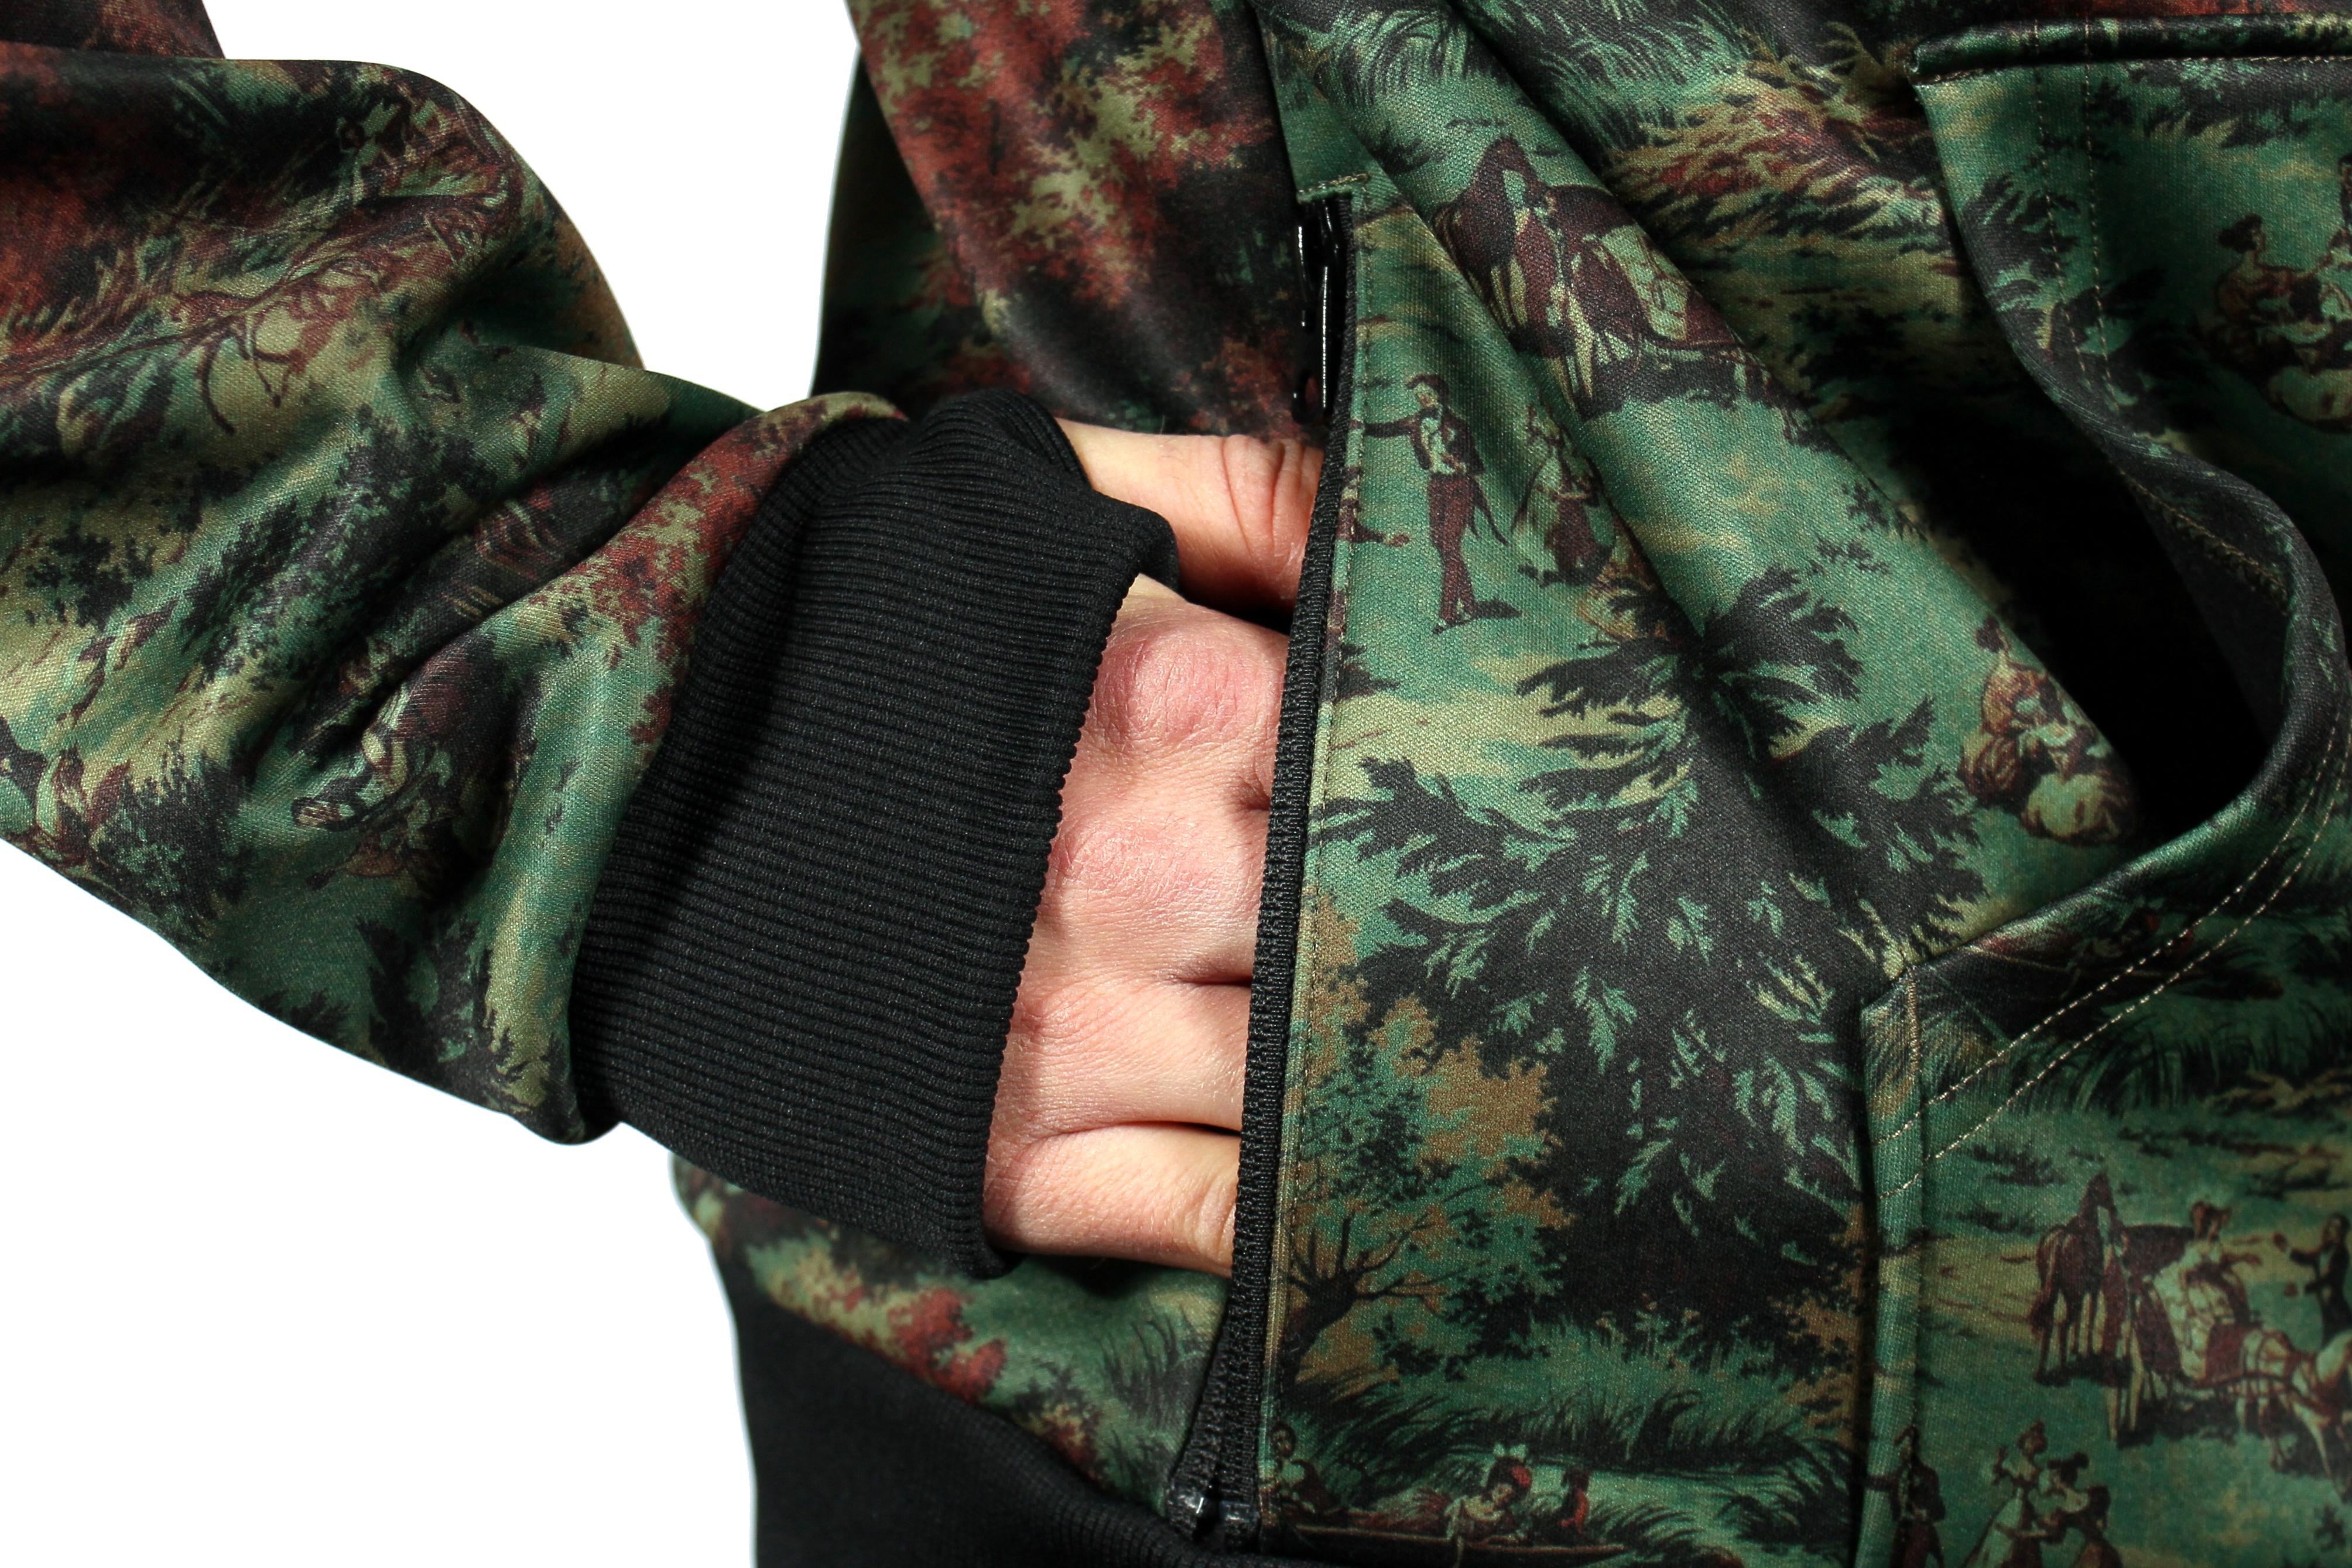 Bluza Aktywna Burton Bonded Hdd (Loam Forest)